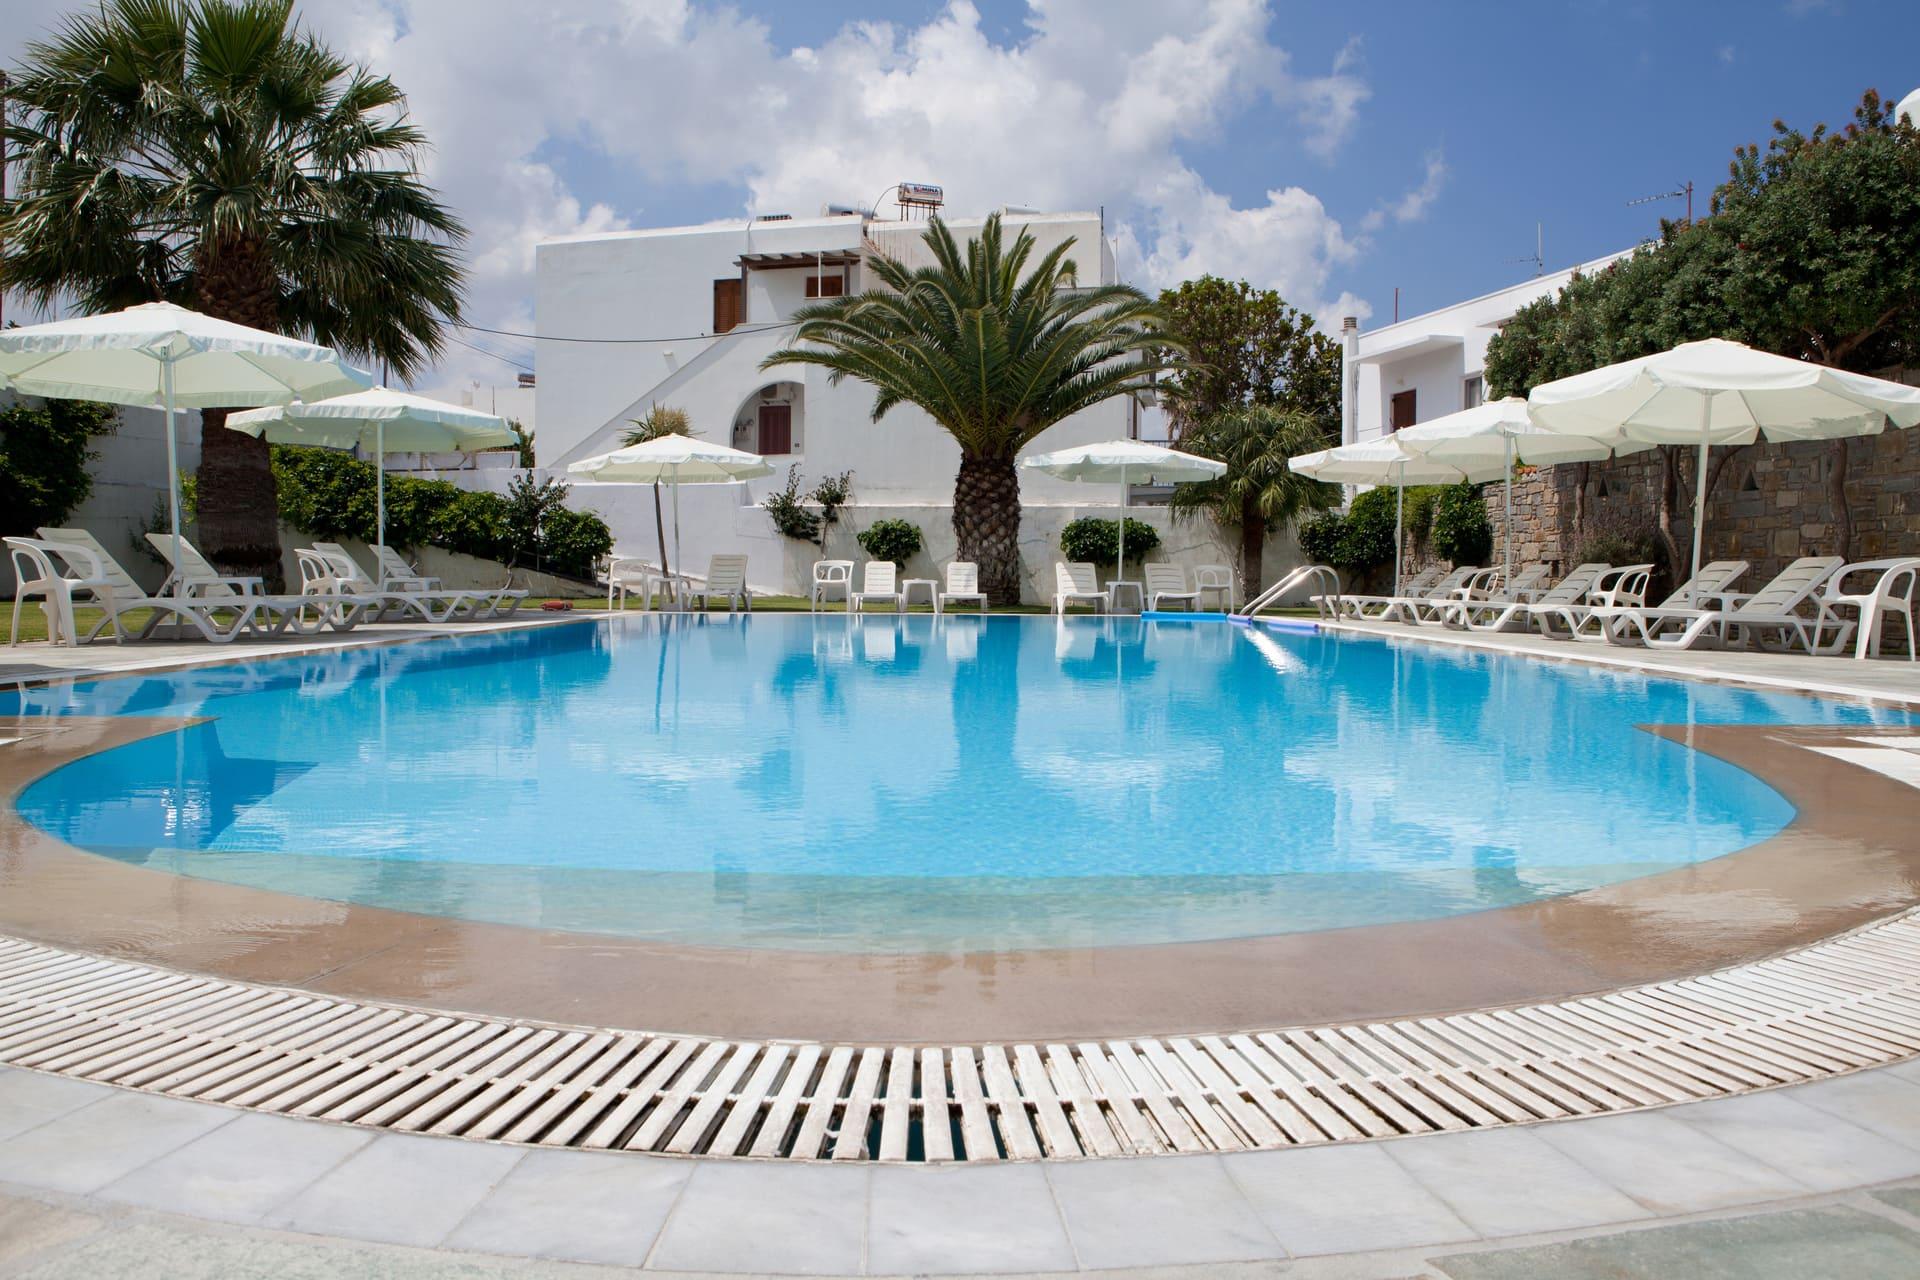 Polos Paros Hotel 25% Discount